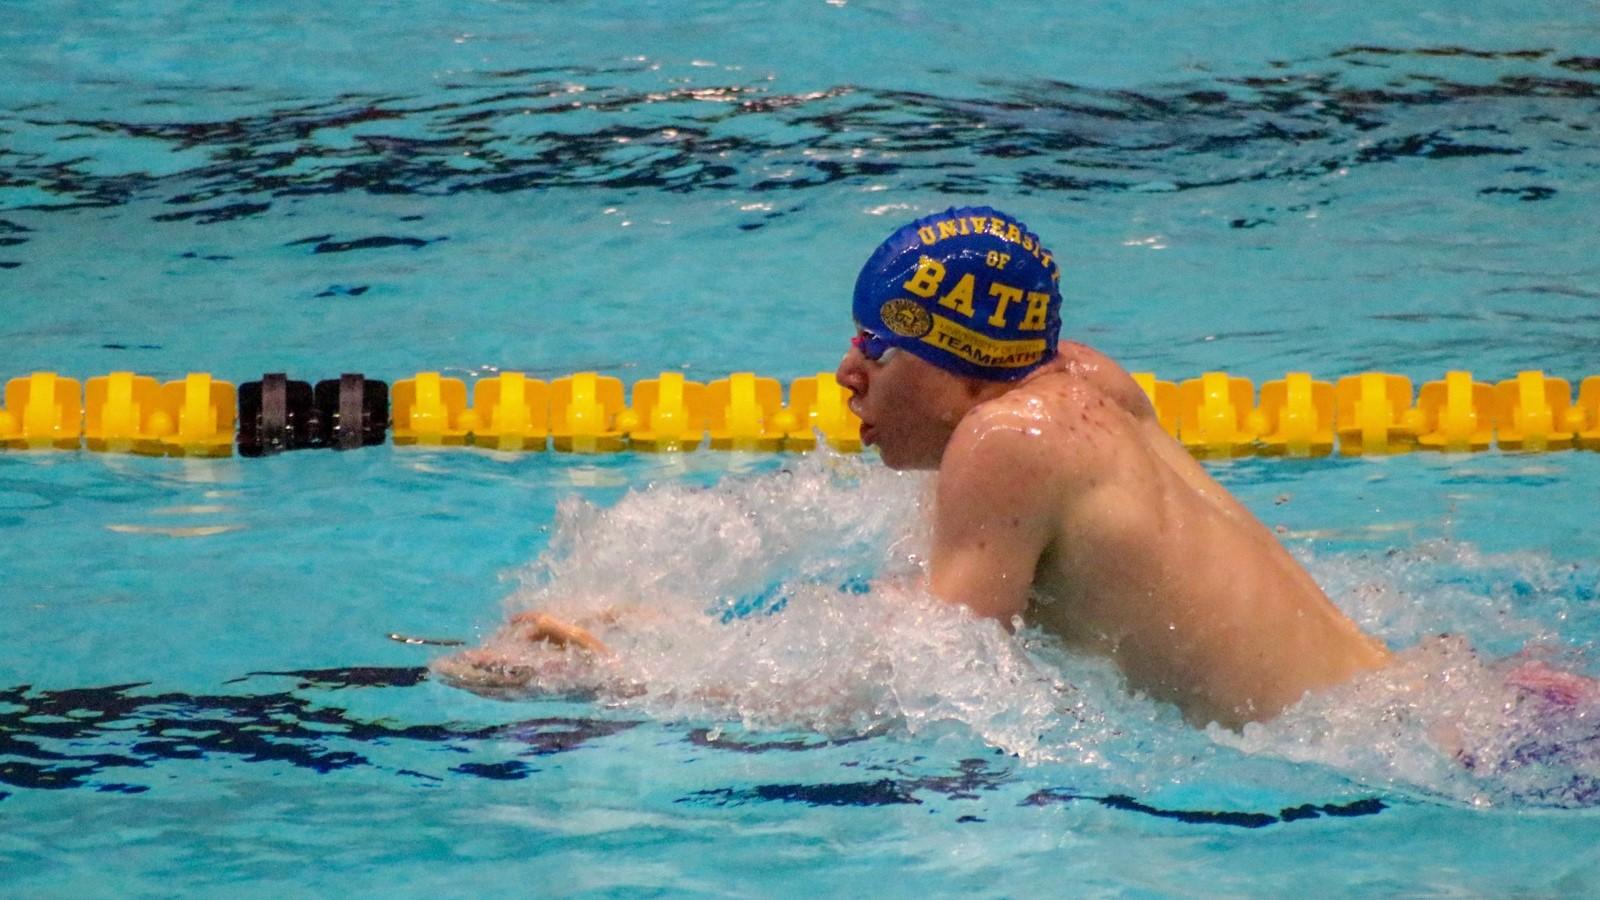 Tom Dean swimming